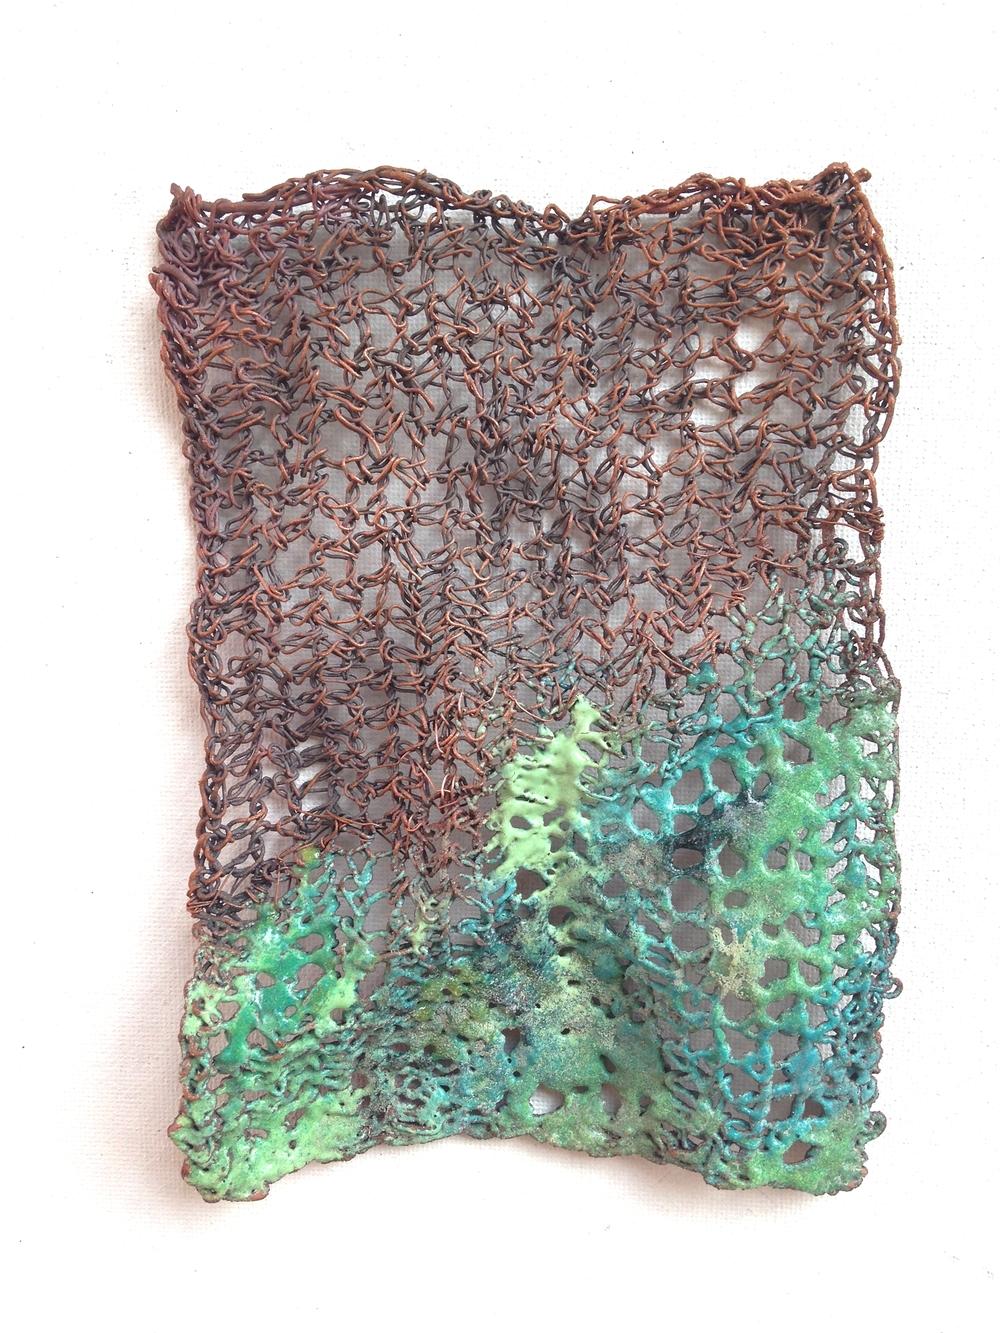 The Art of Erosion,2014.  Copper, enamel